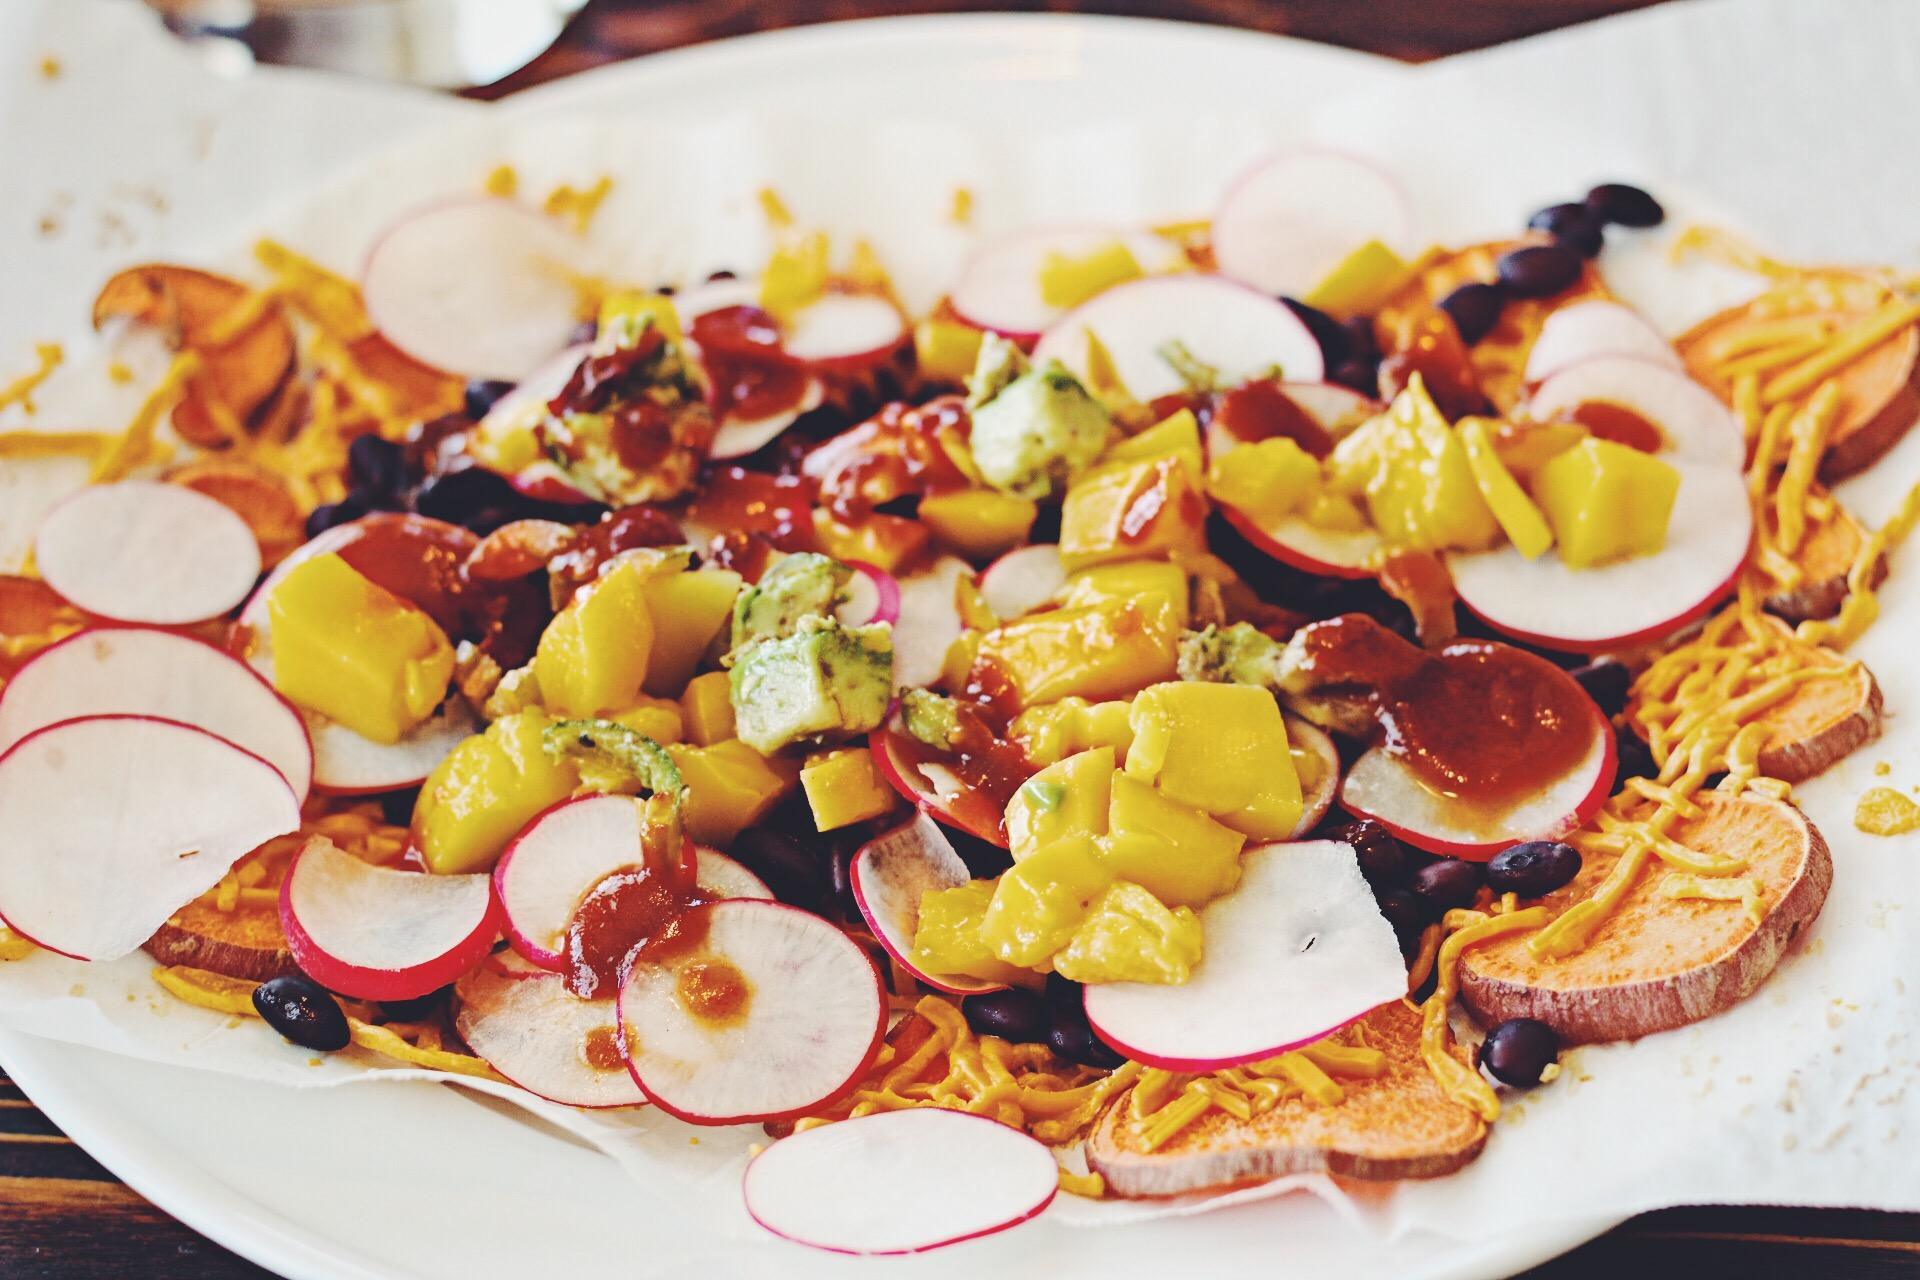 Vegan Sweet Potato Nachos from Love and Lemons